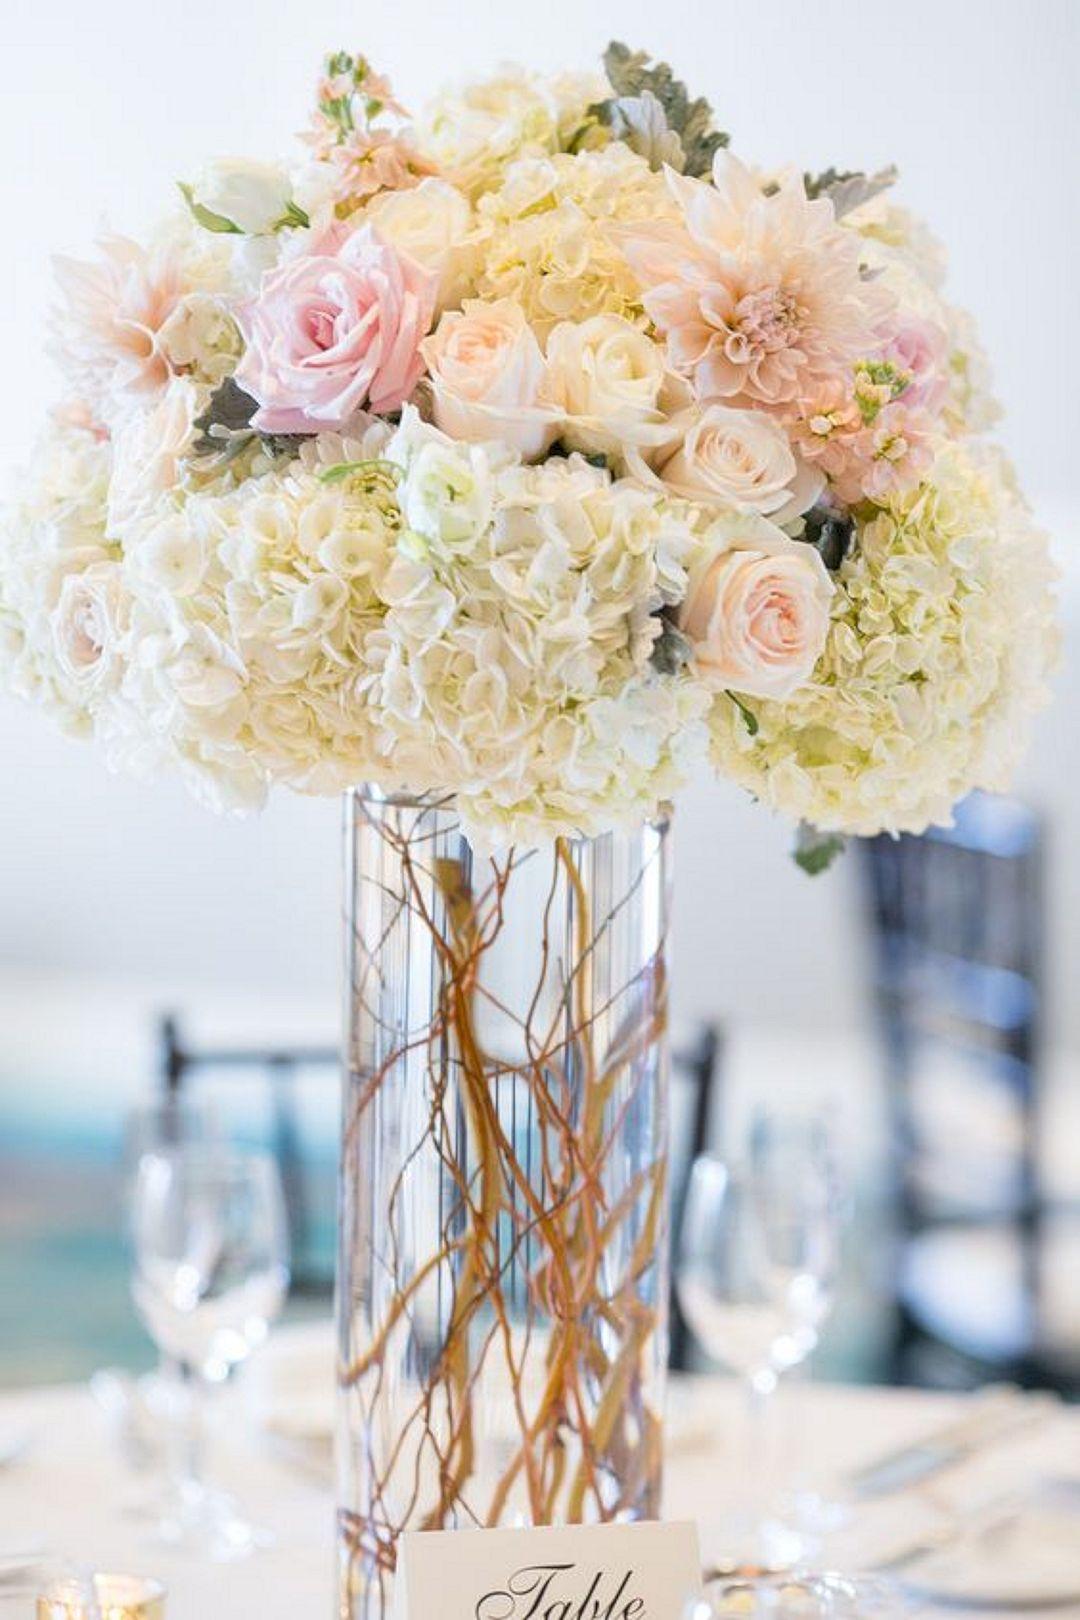 09 DIY Creative Rustic Chic Wedding Centerpieces Ideas | Pinterest ...